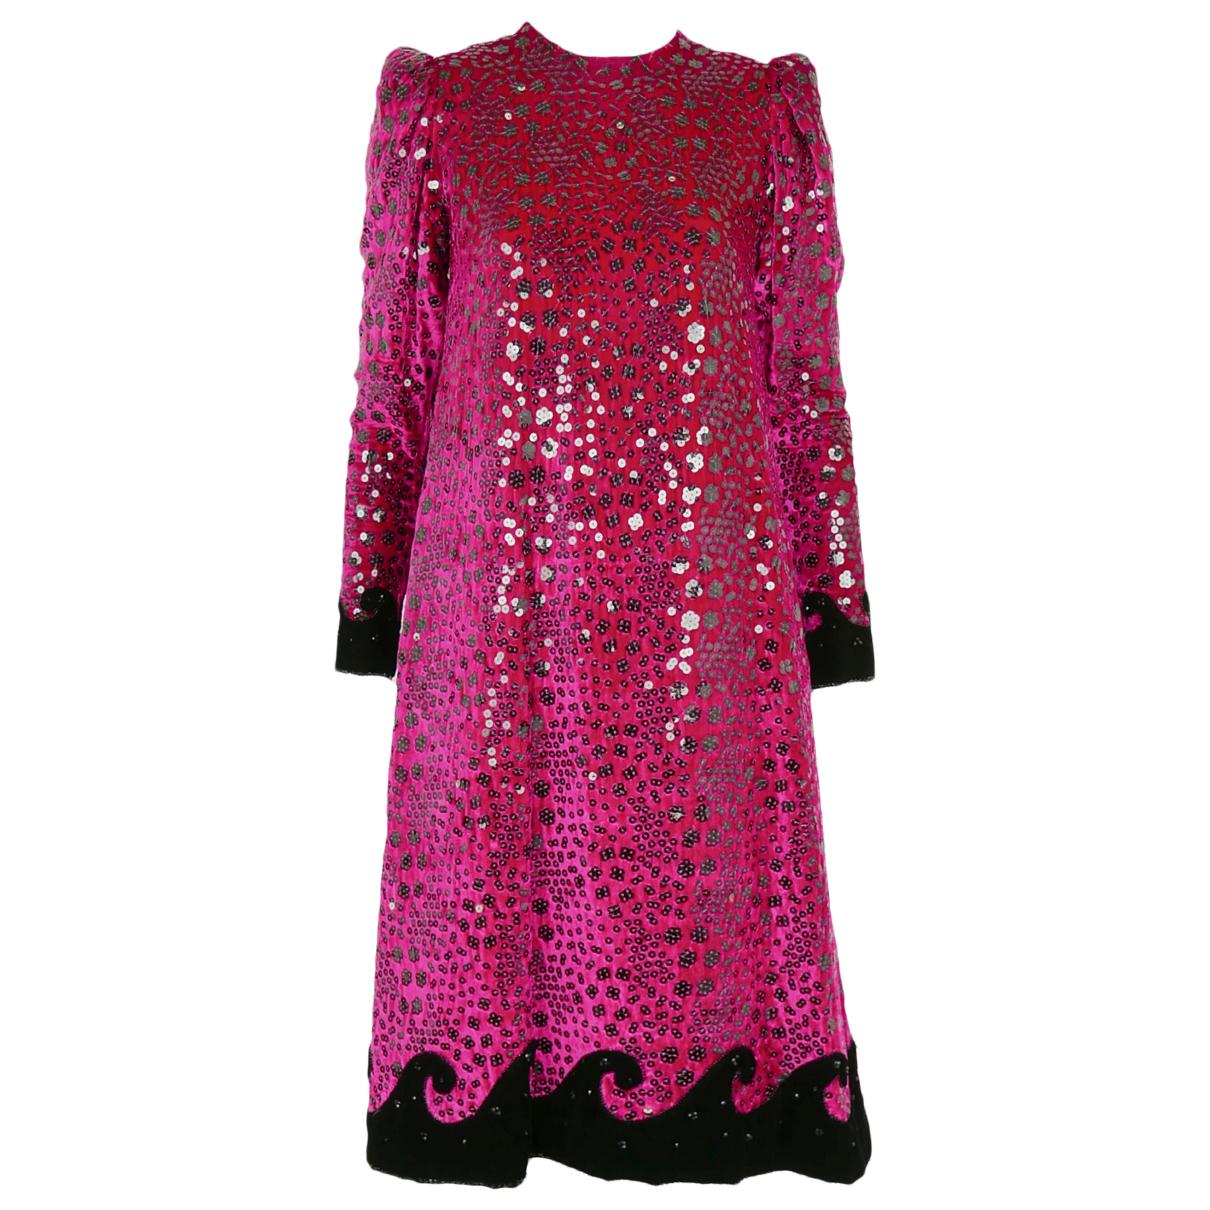 Givenchy \N Kleid in  Rosa Samt